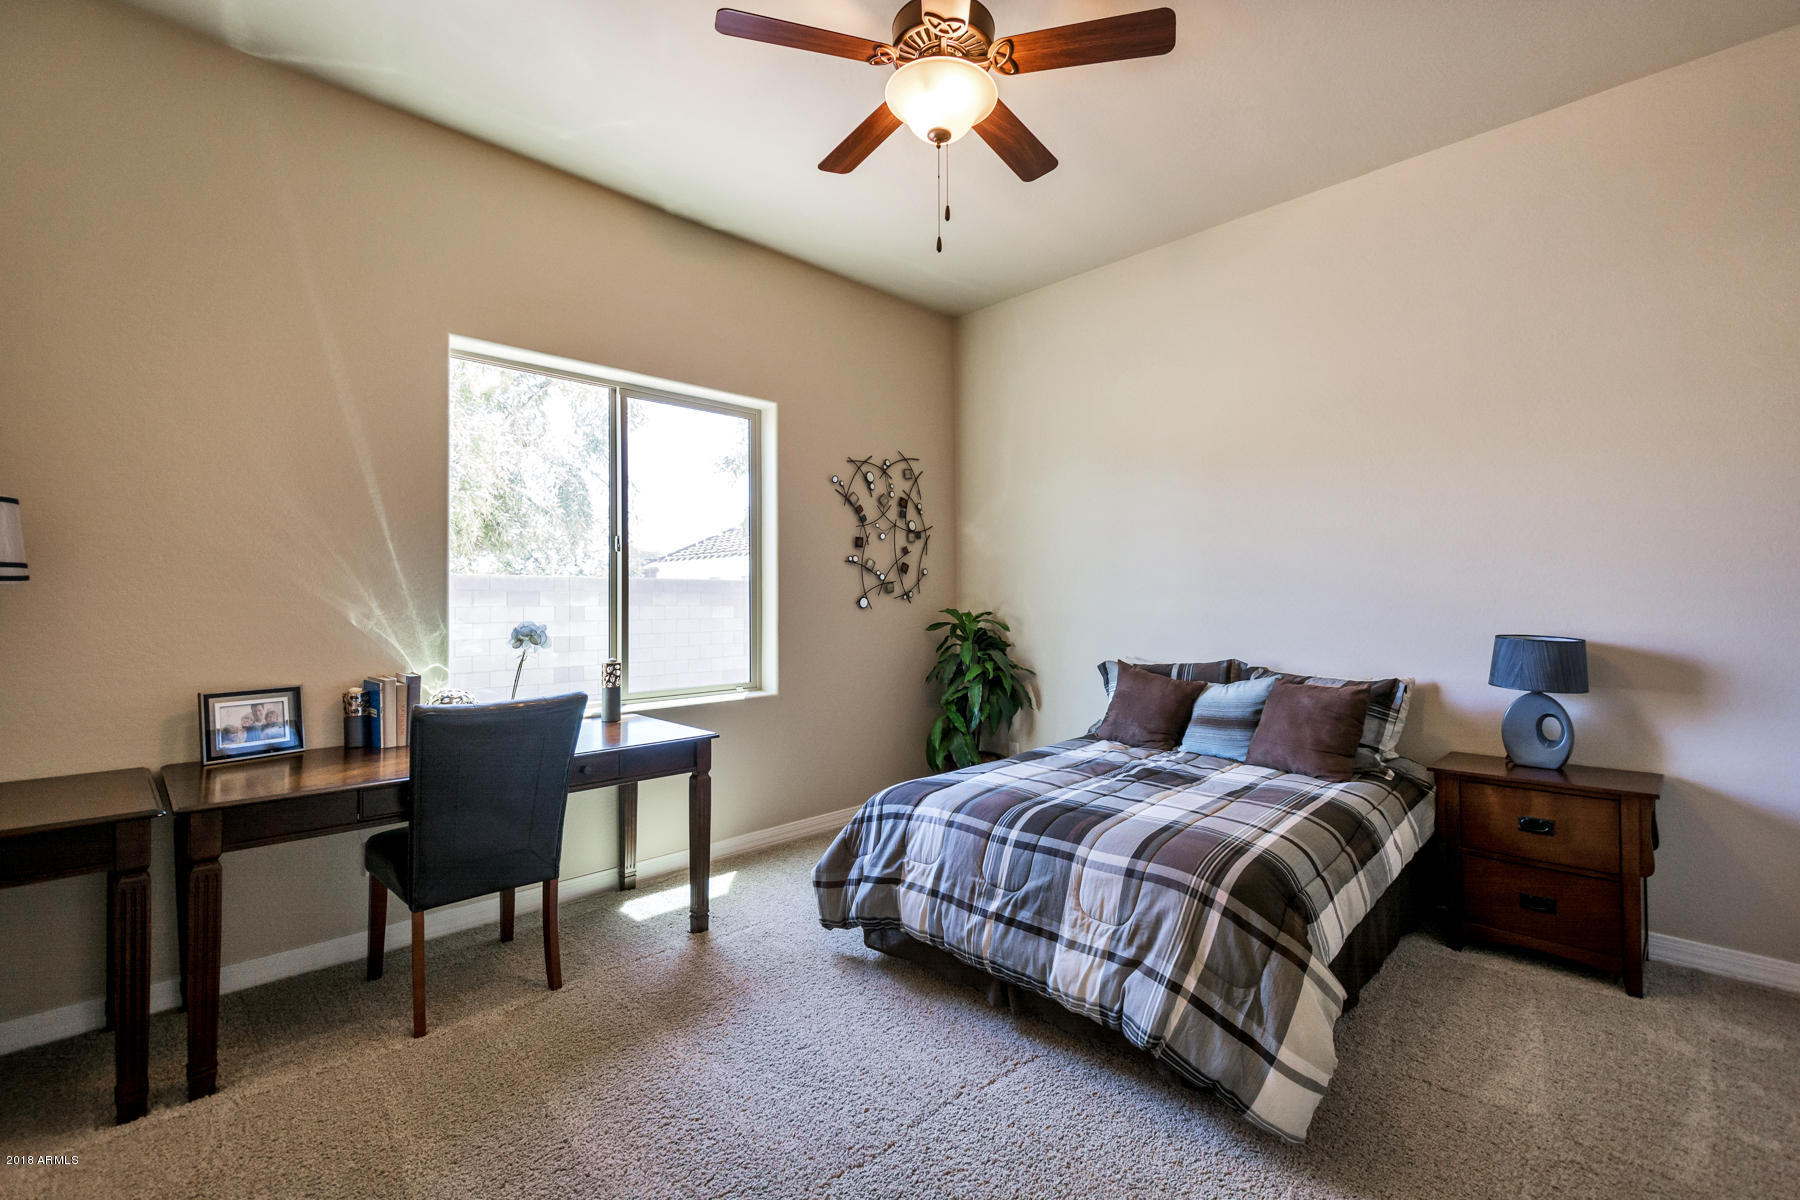 MLS 5728831 8357 W MISSOURI Avenue, Glendale, AZ 85305 Glendale AZ West Glendale